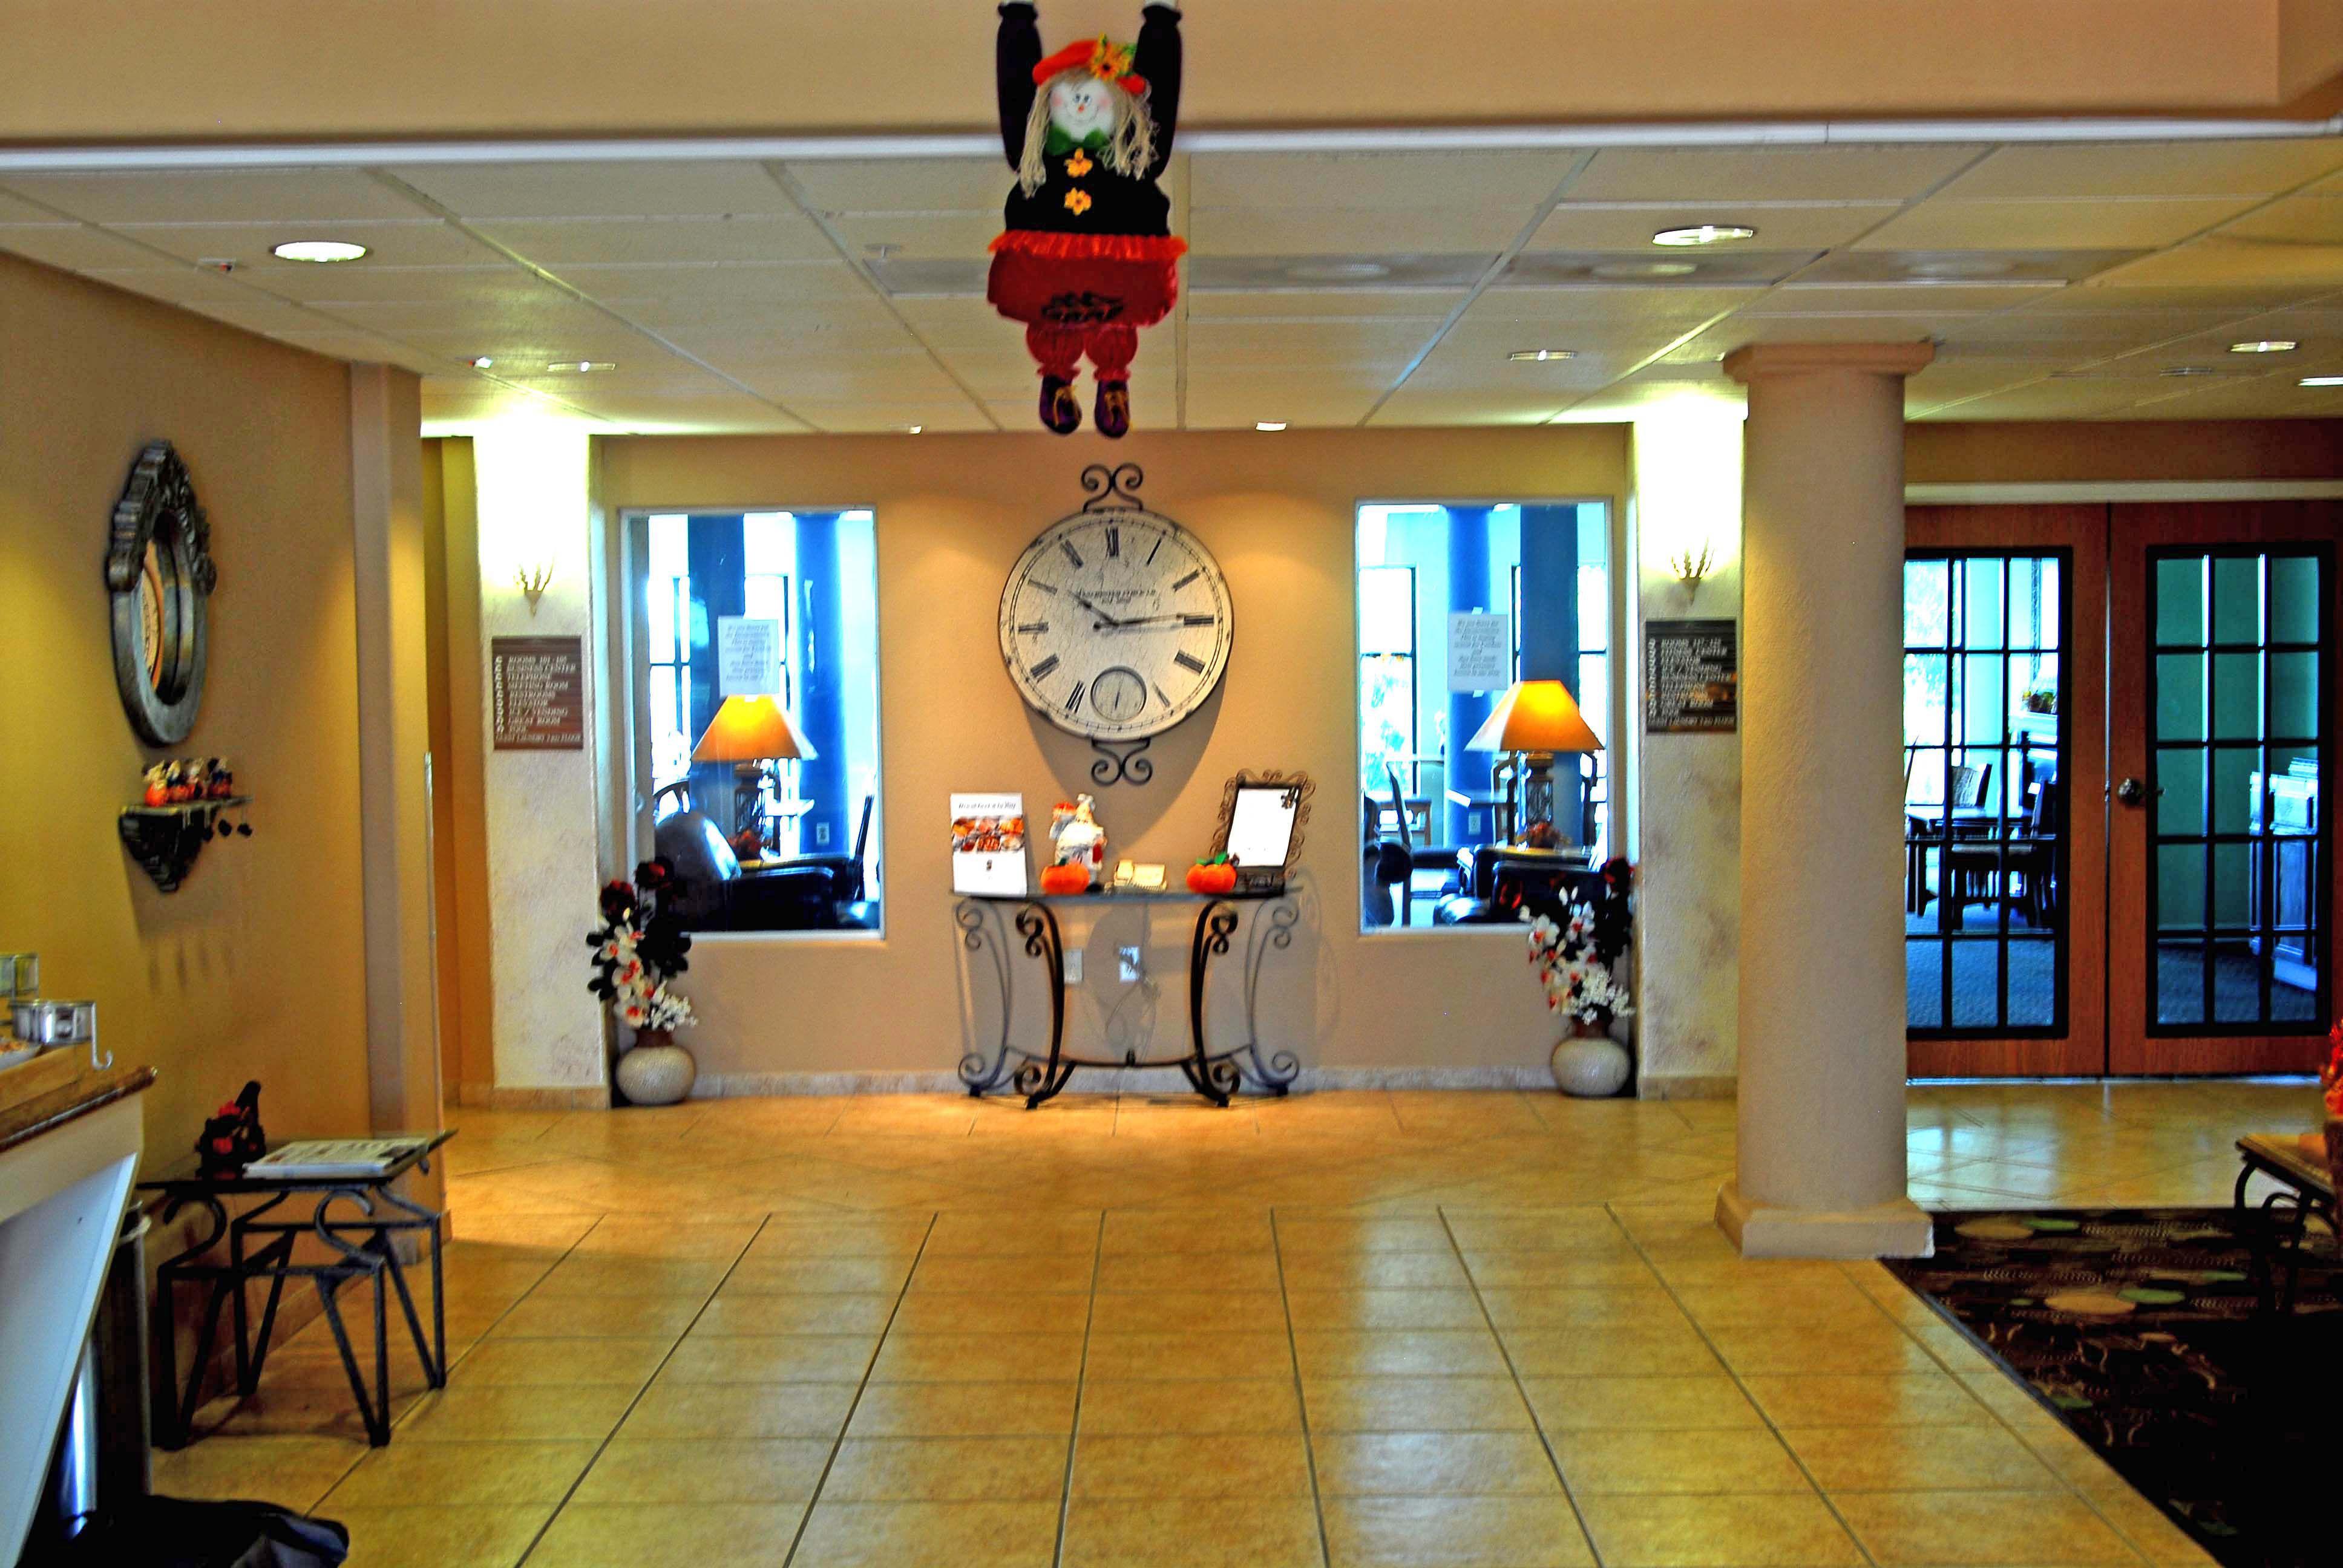 Holiday Inn Express & Suites Elgin image 7